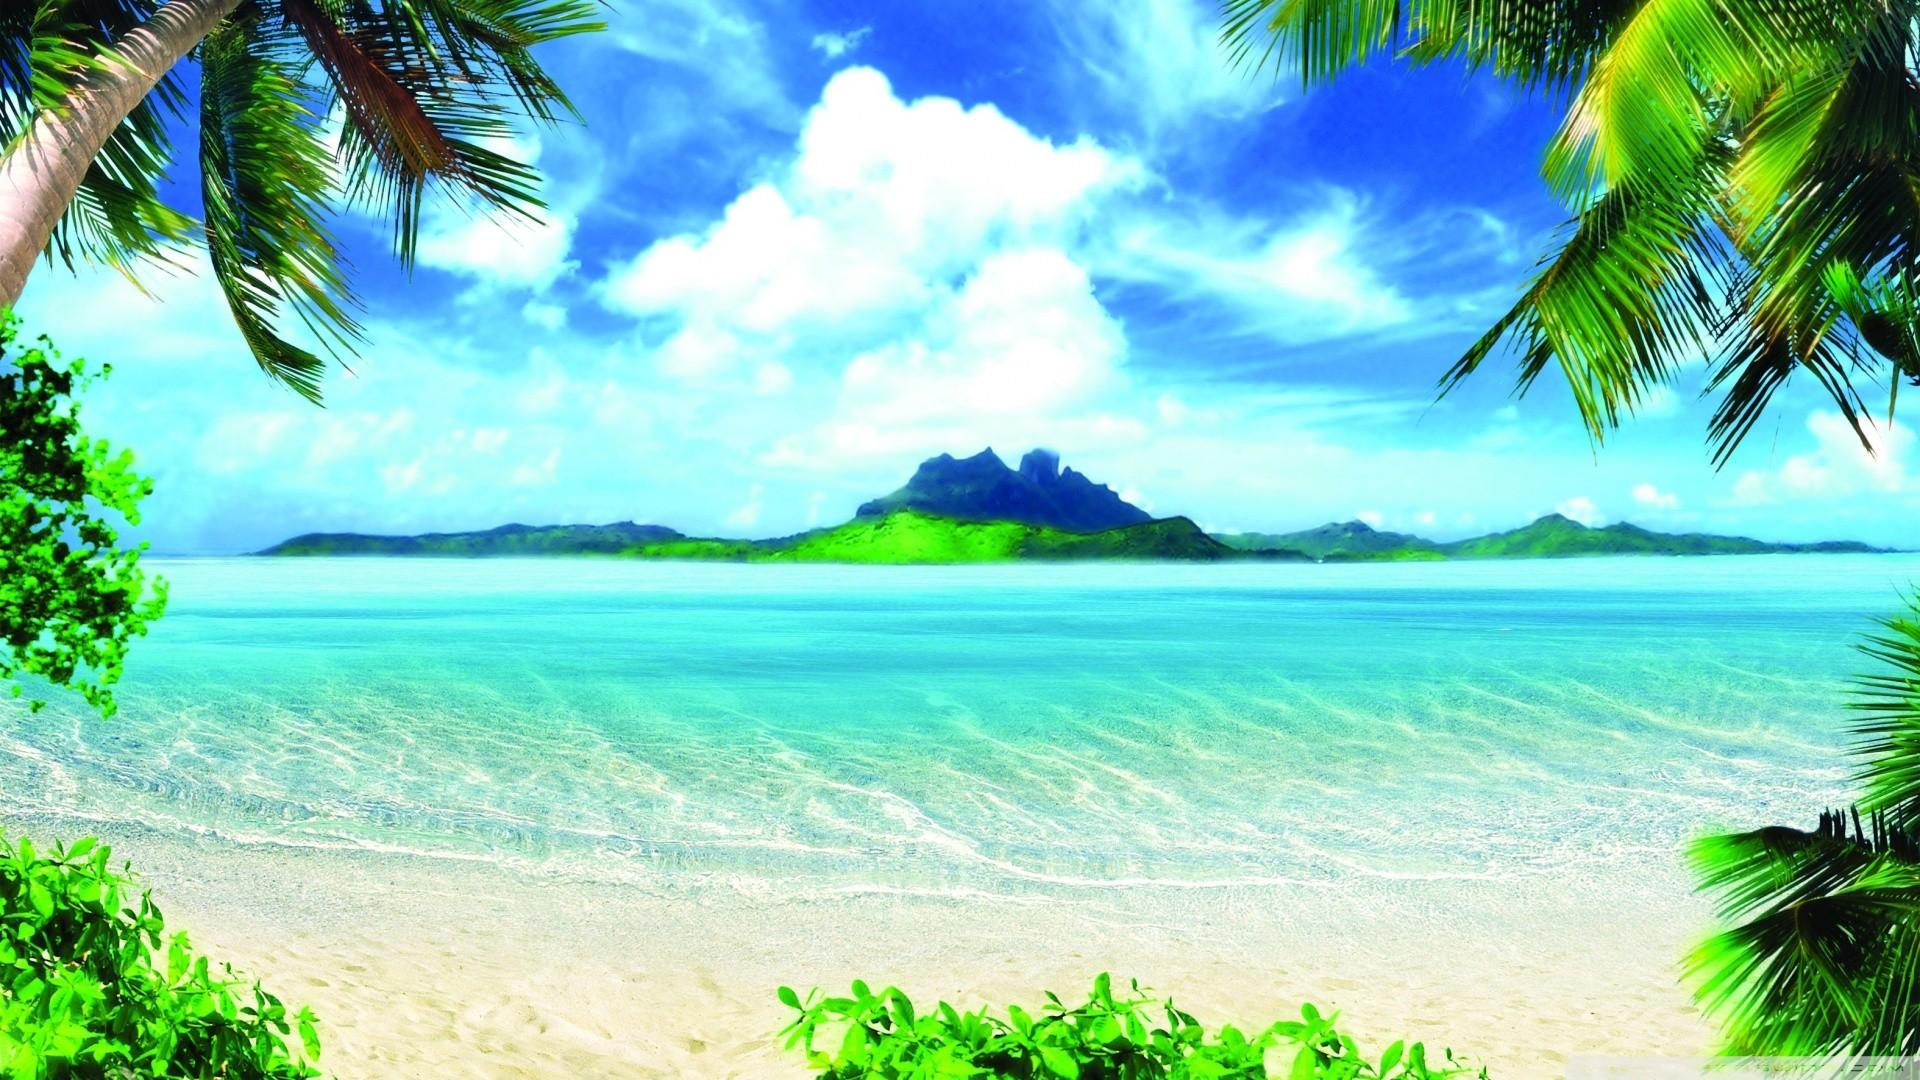 Beach HD Wallpaper | Background Image | 1920x1080 | ID ...